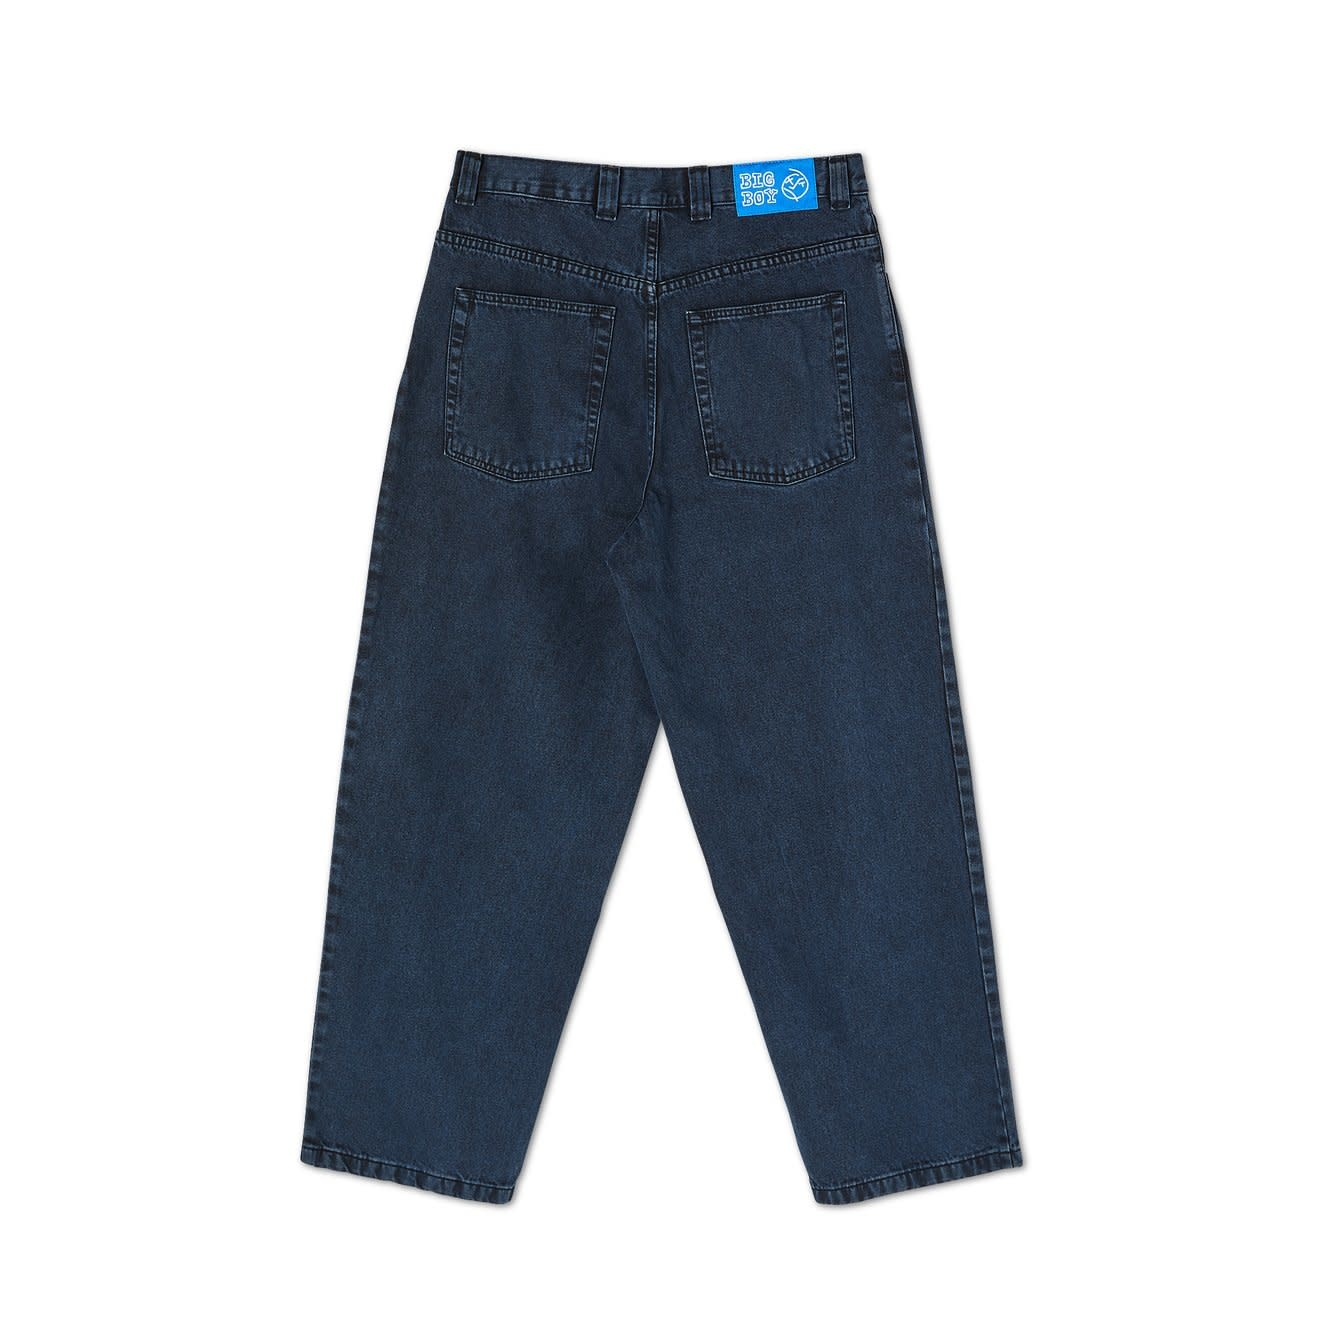 Polar Skate Co. Big Boy Jeans Blue/Black